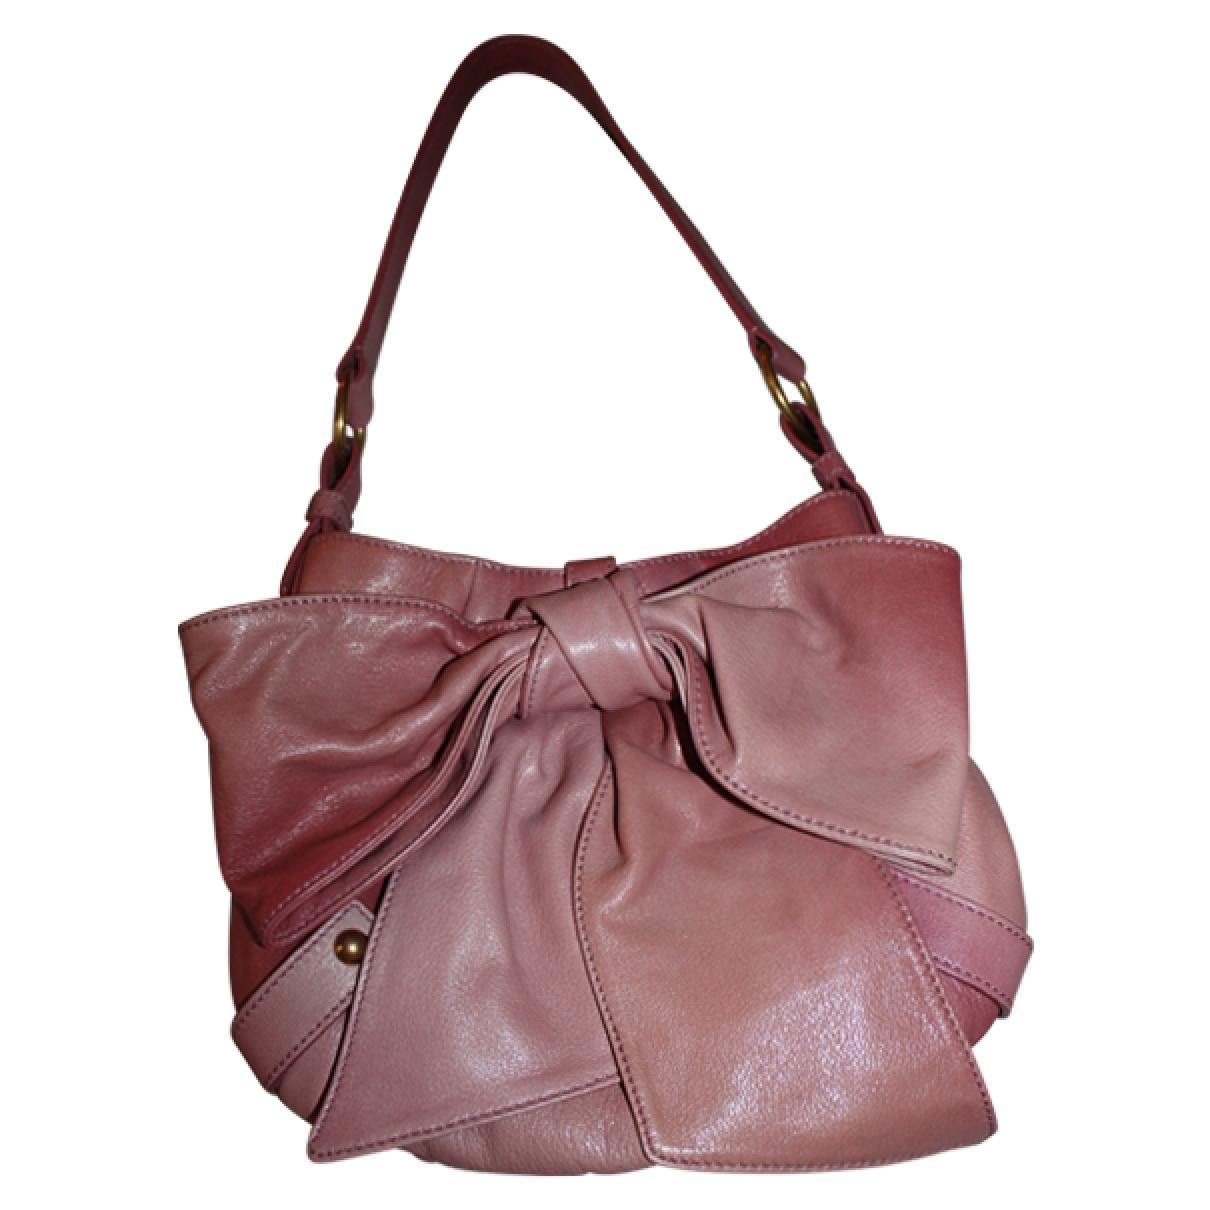 Saint Laurent Mens Leather Jacket | Handbag Yves Saint Laurent | Yves Saint Laurent Handbags